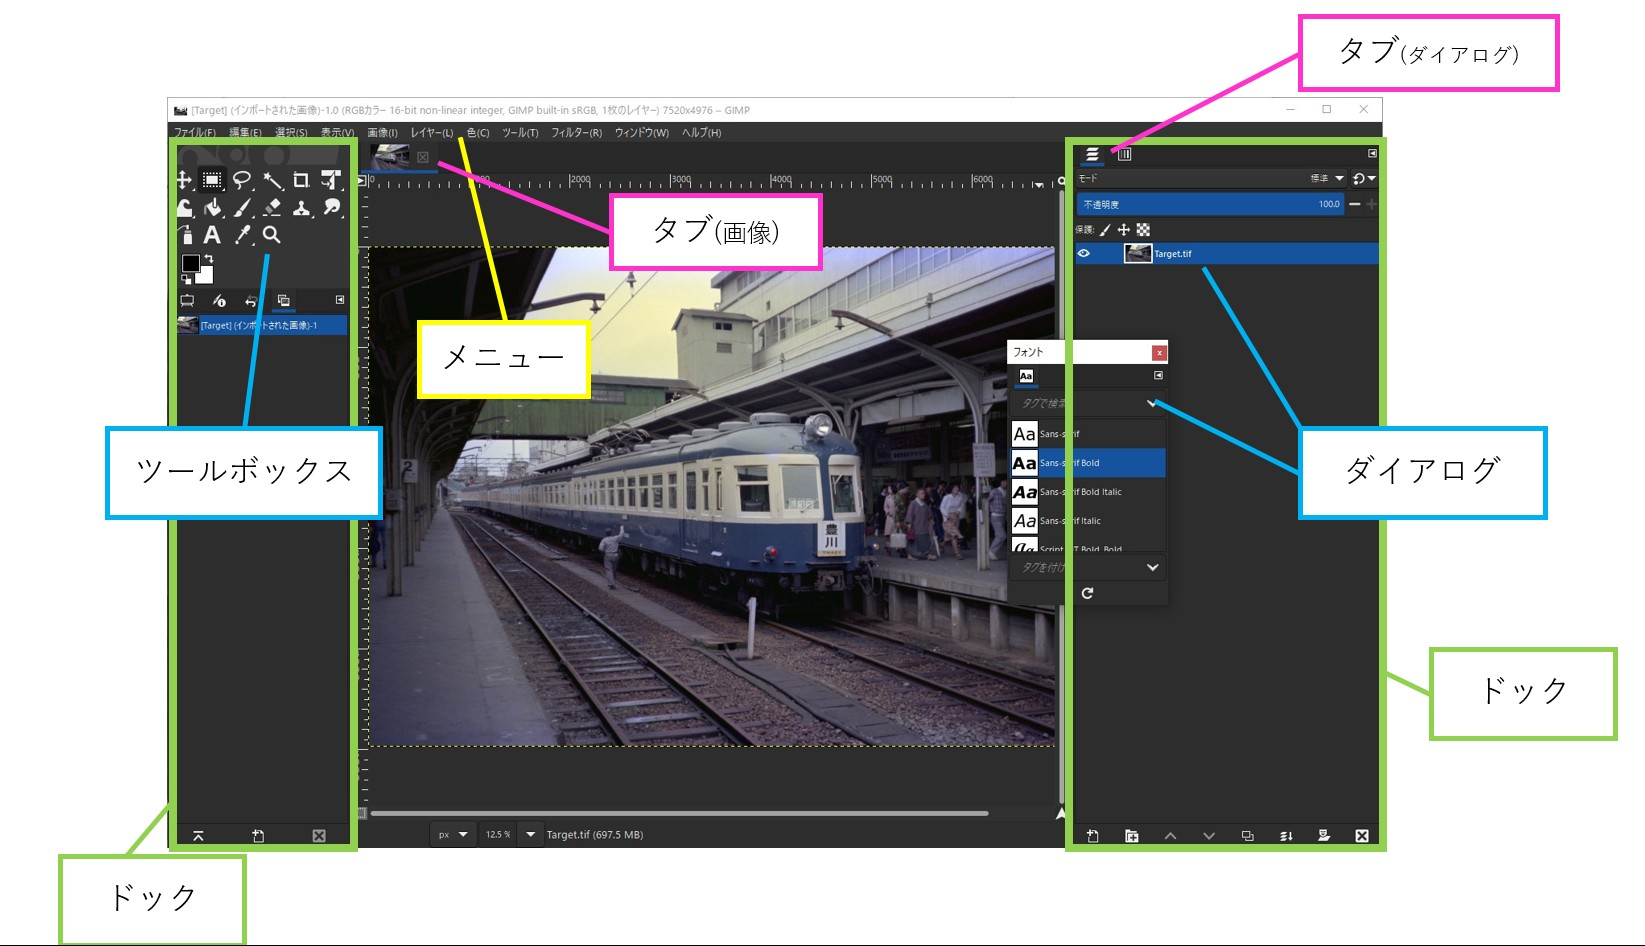 f:id:yasuo_ssi:20210303230646j:plain